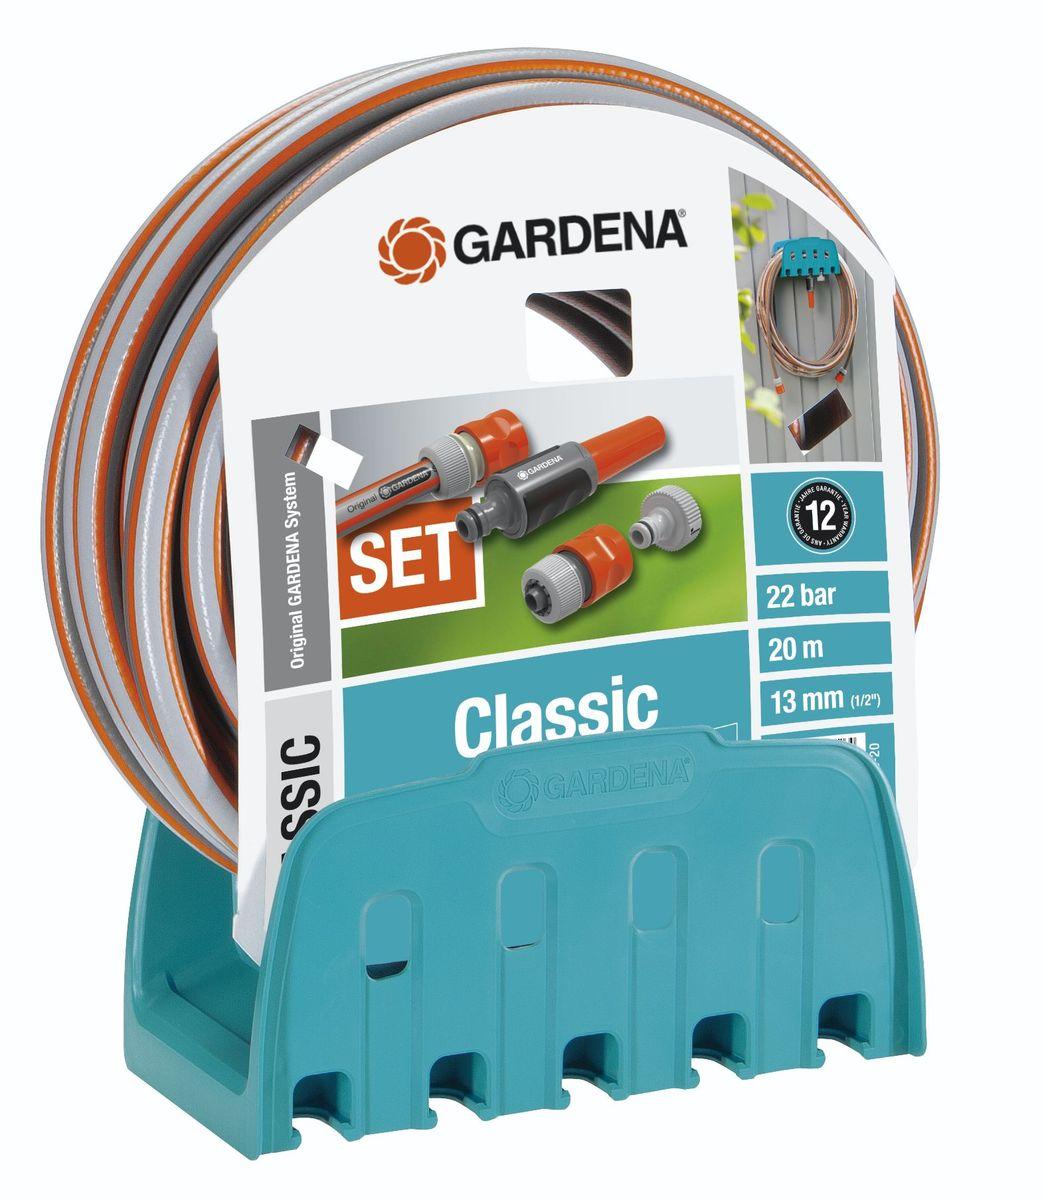 Кронштейн настенный Gardena Classic со шлангом катушка со шлангом и фитингом gardena 50 classic 02691 20